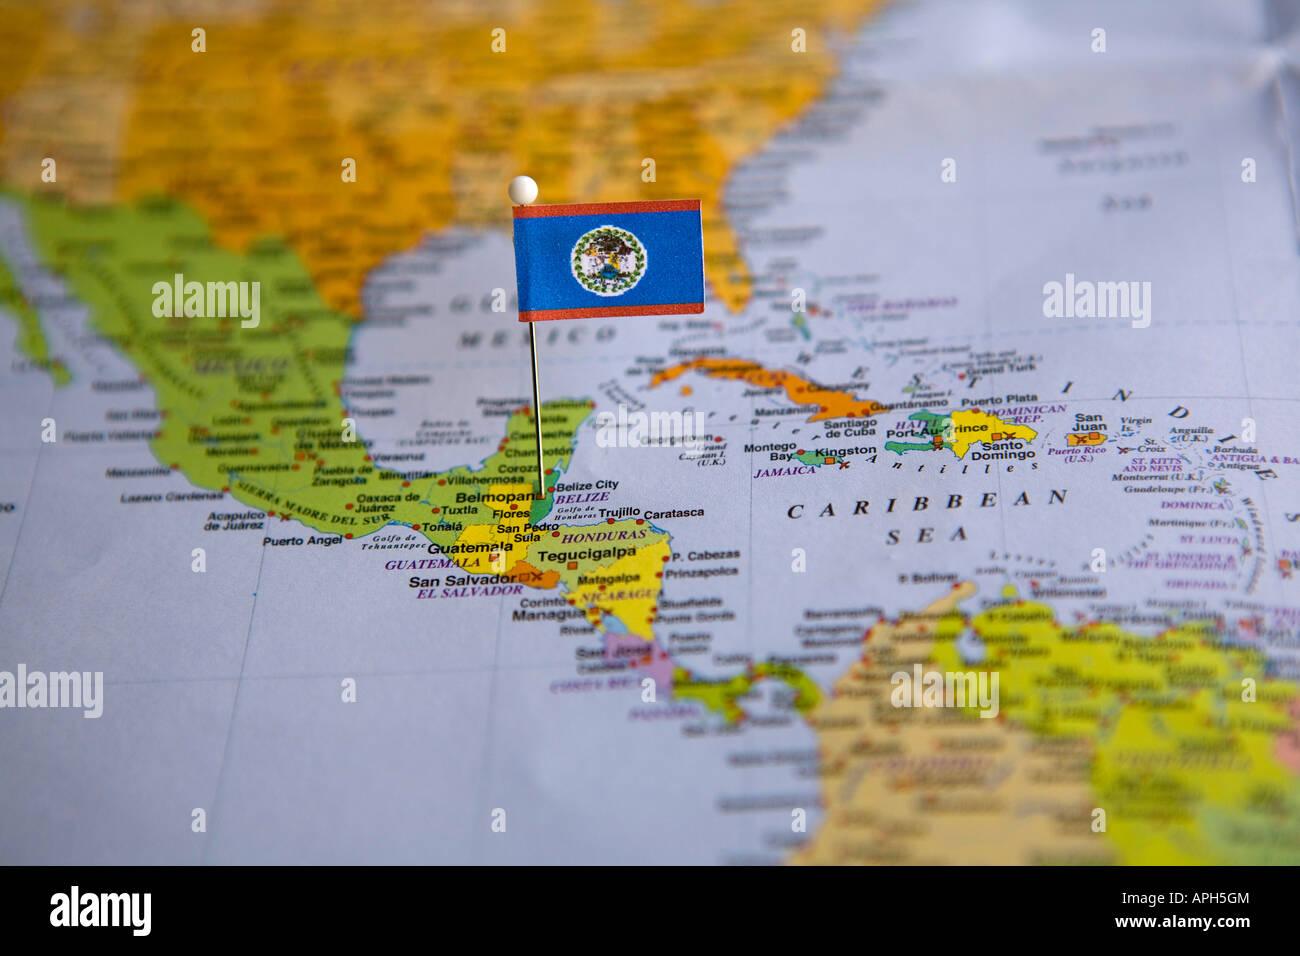 Flag Pin Placed On World Map In The Capital Of Belize Belmopan - Belize map belmopan